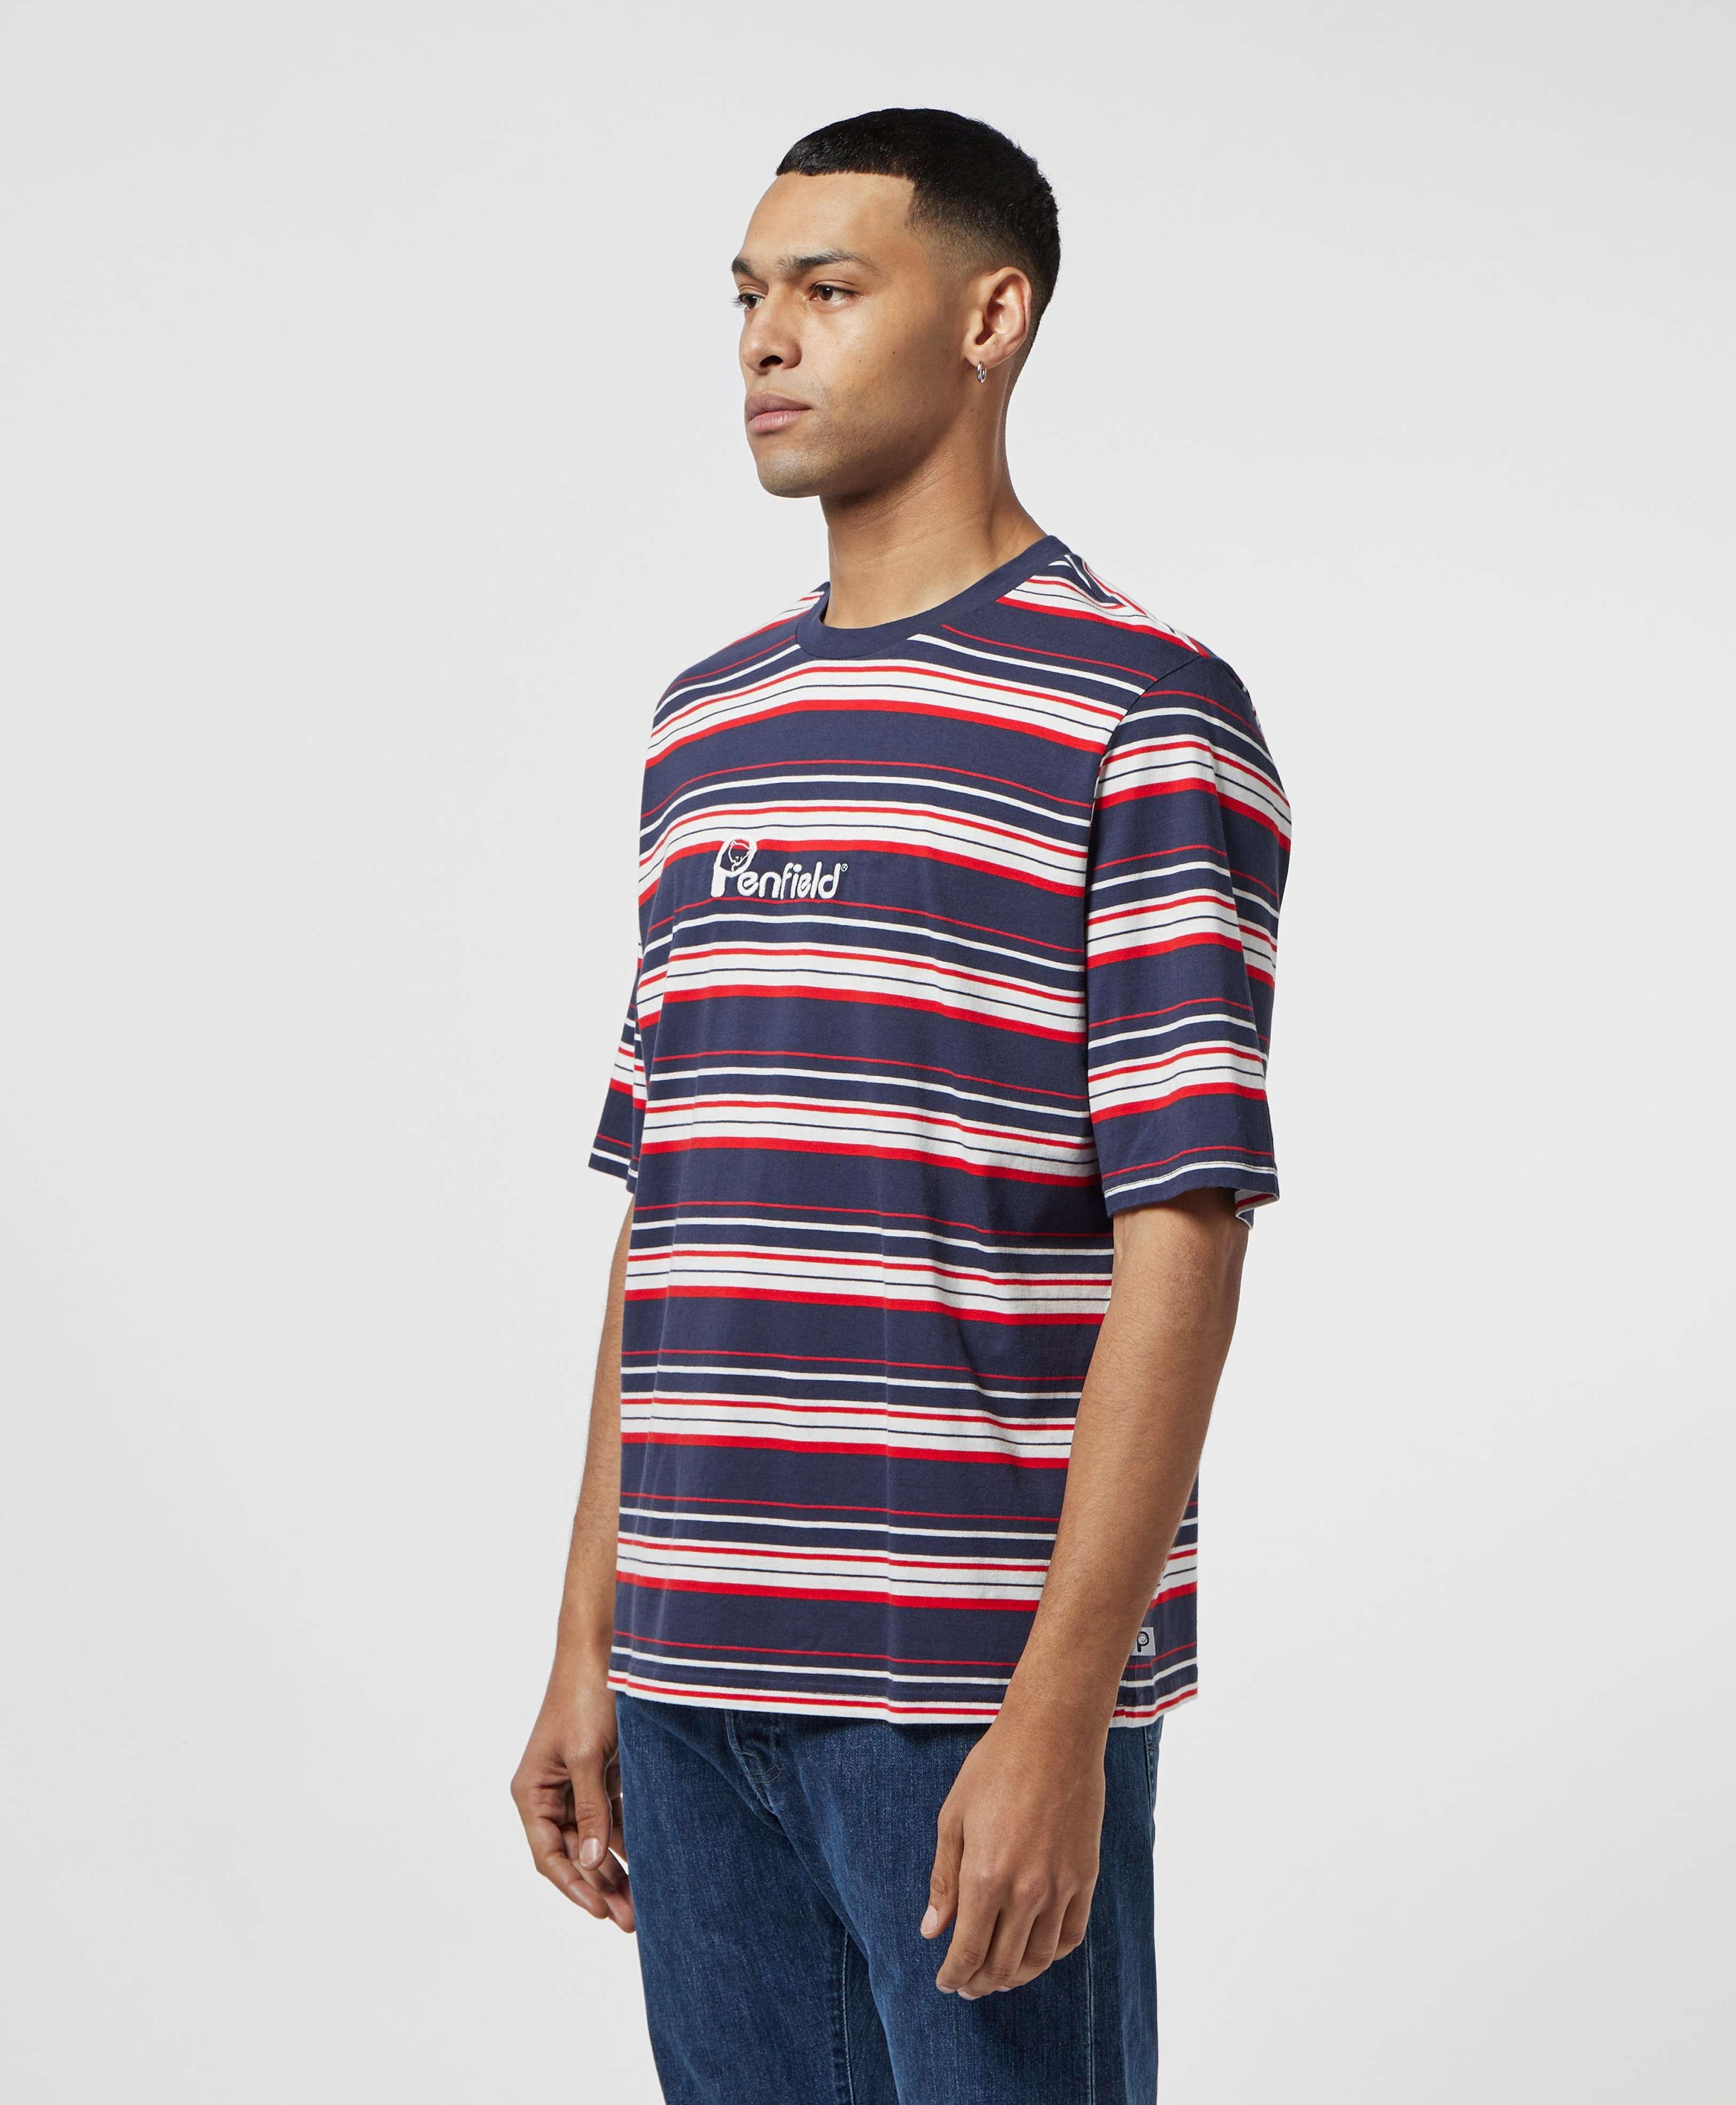 Penfield Guano Stripe Short Sleeve T-Shirt